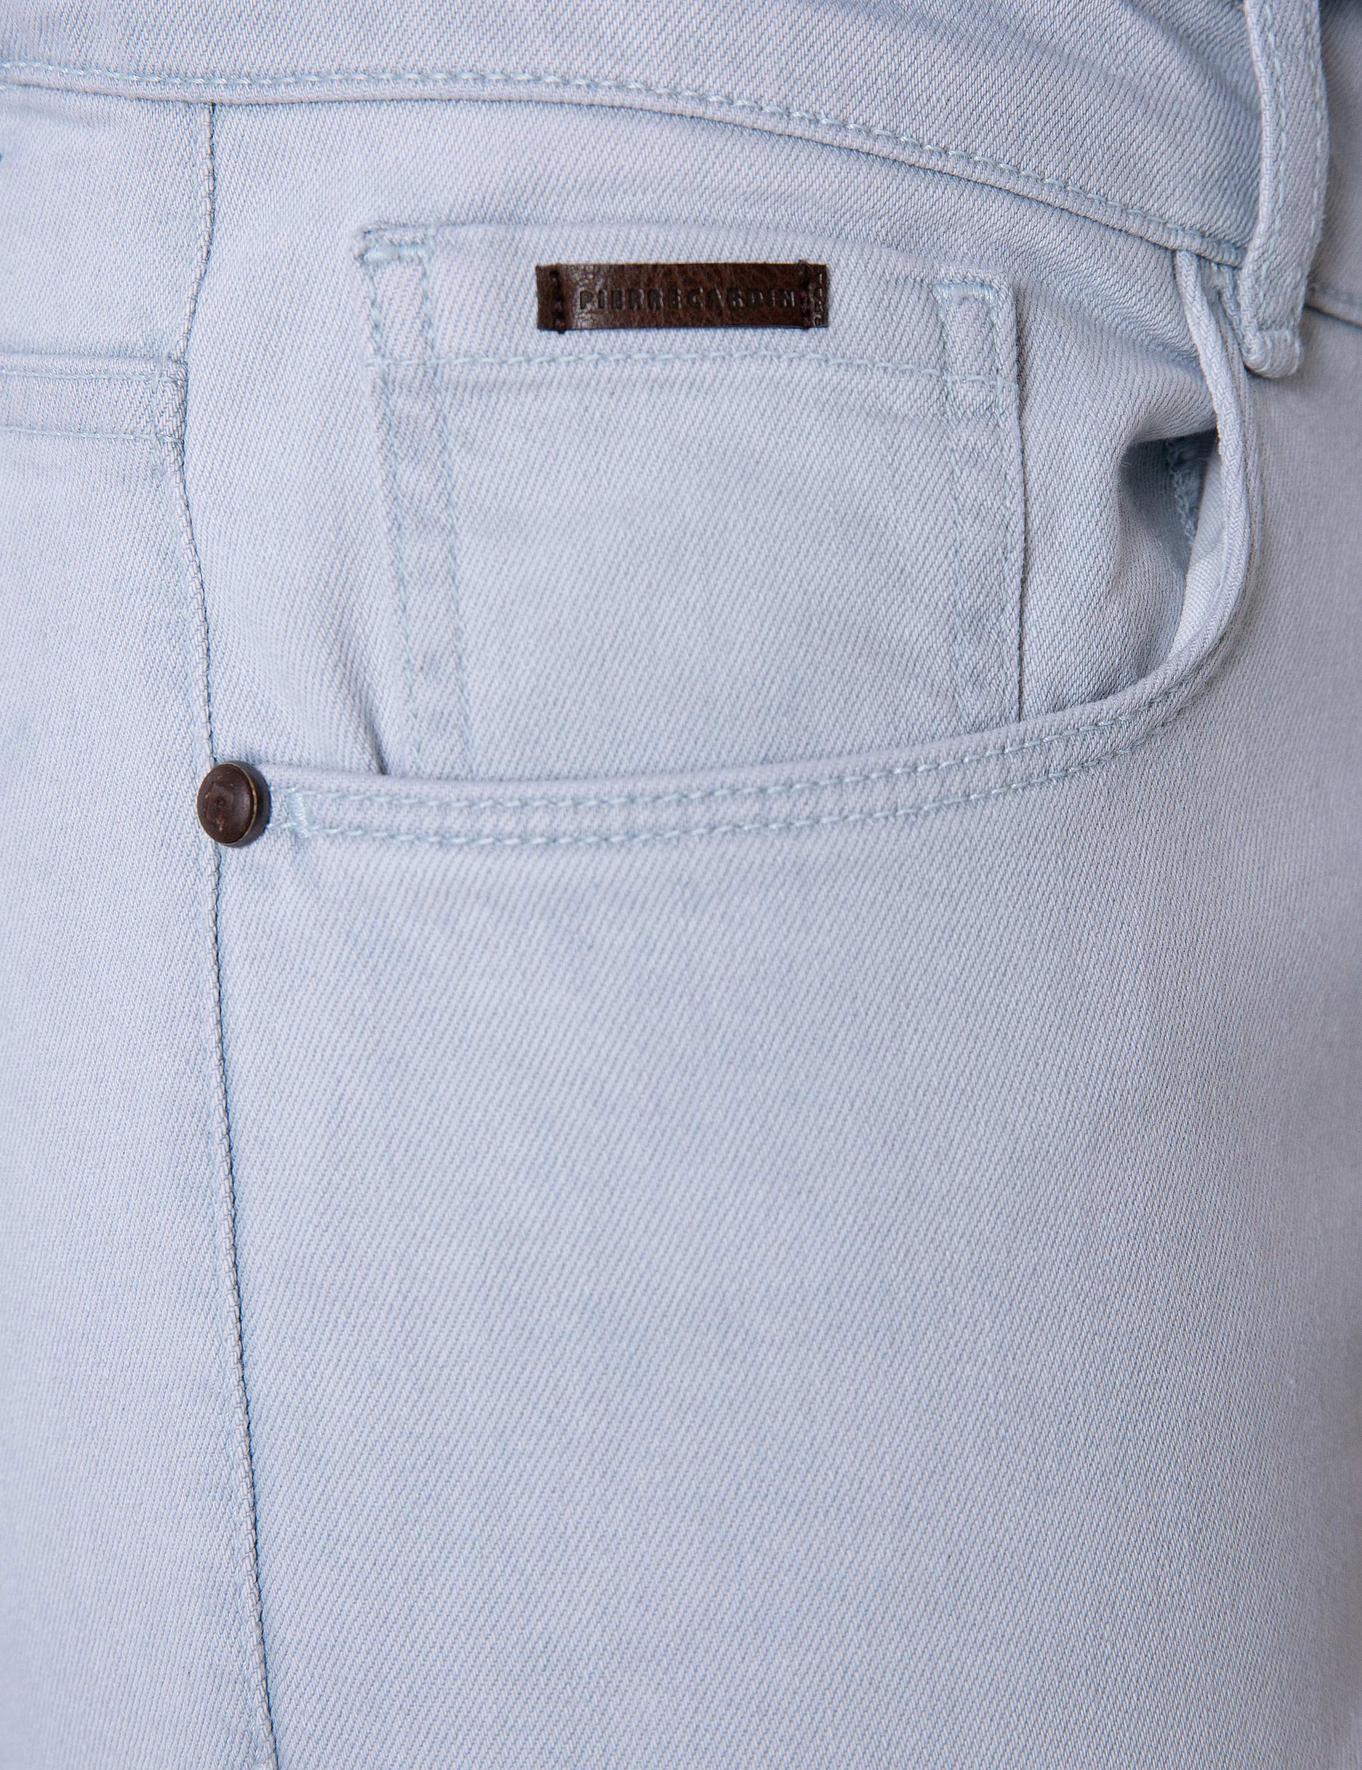 Açık Gri Slim Fit Denim Pantolon